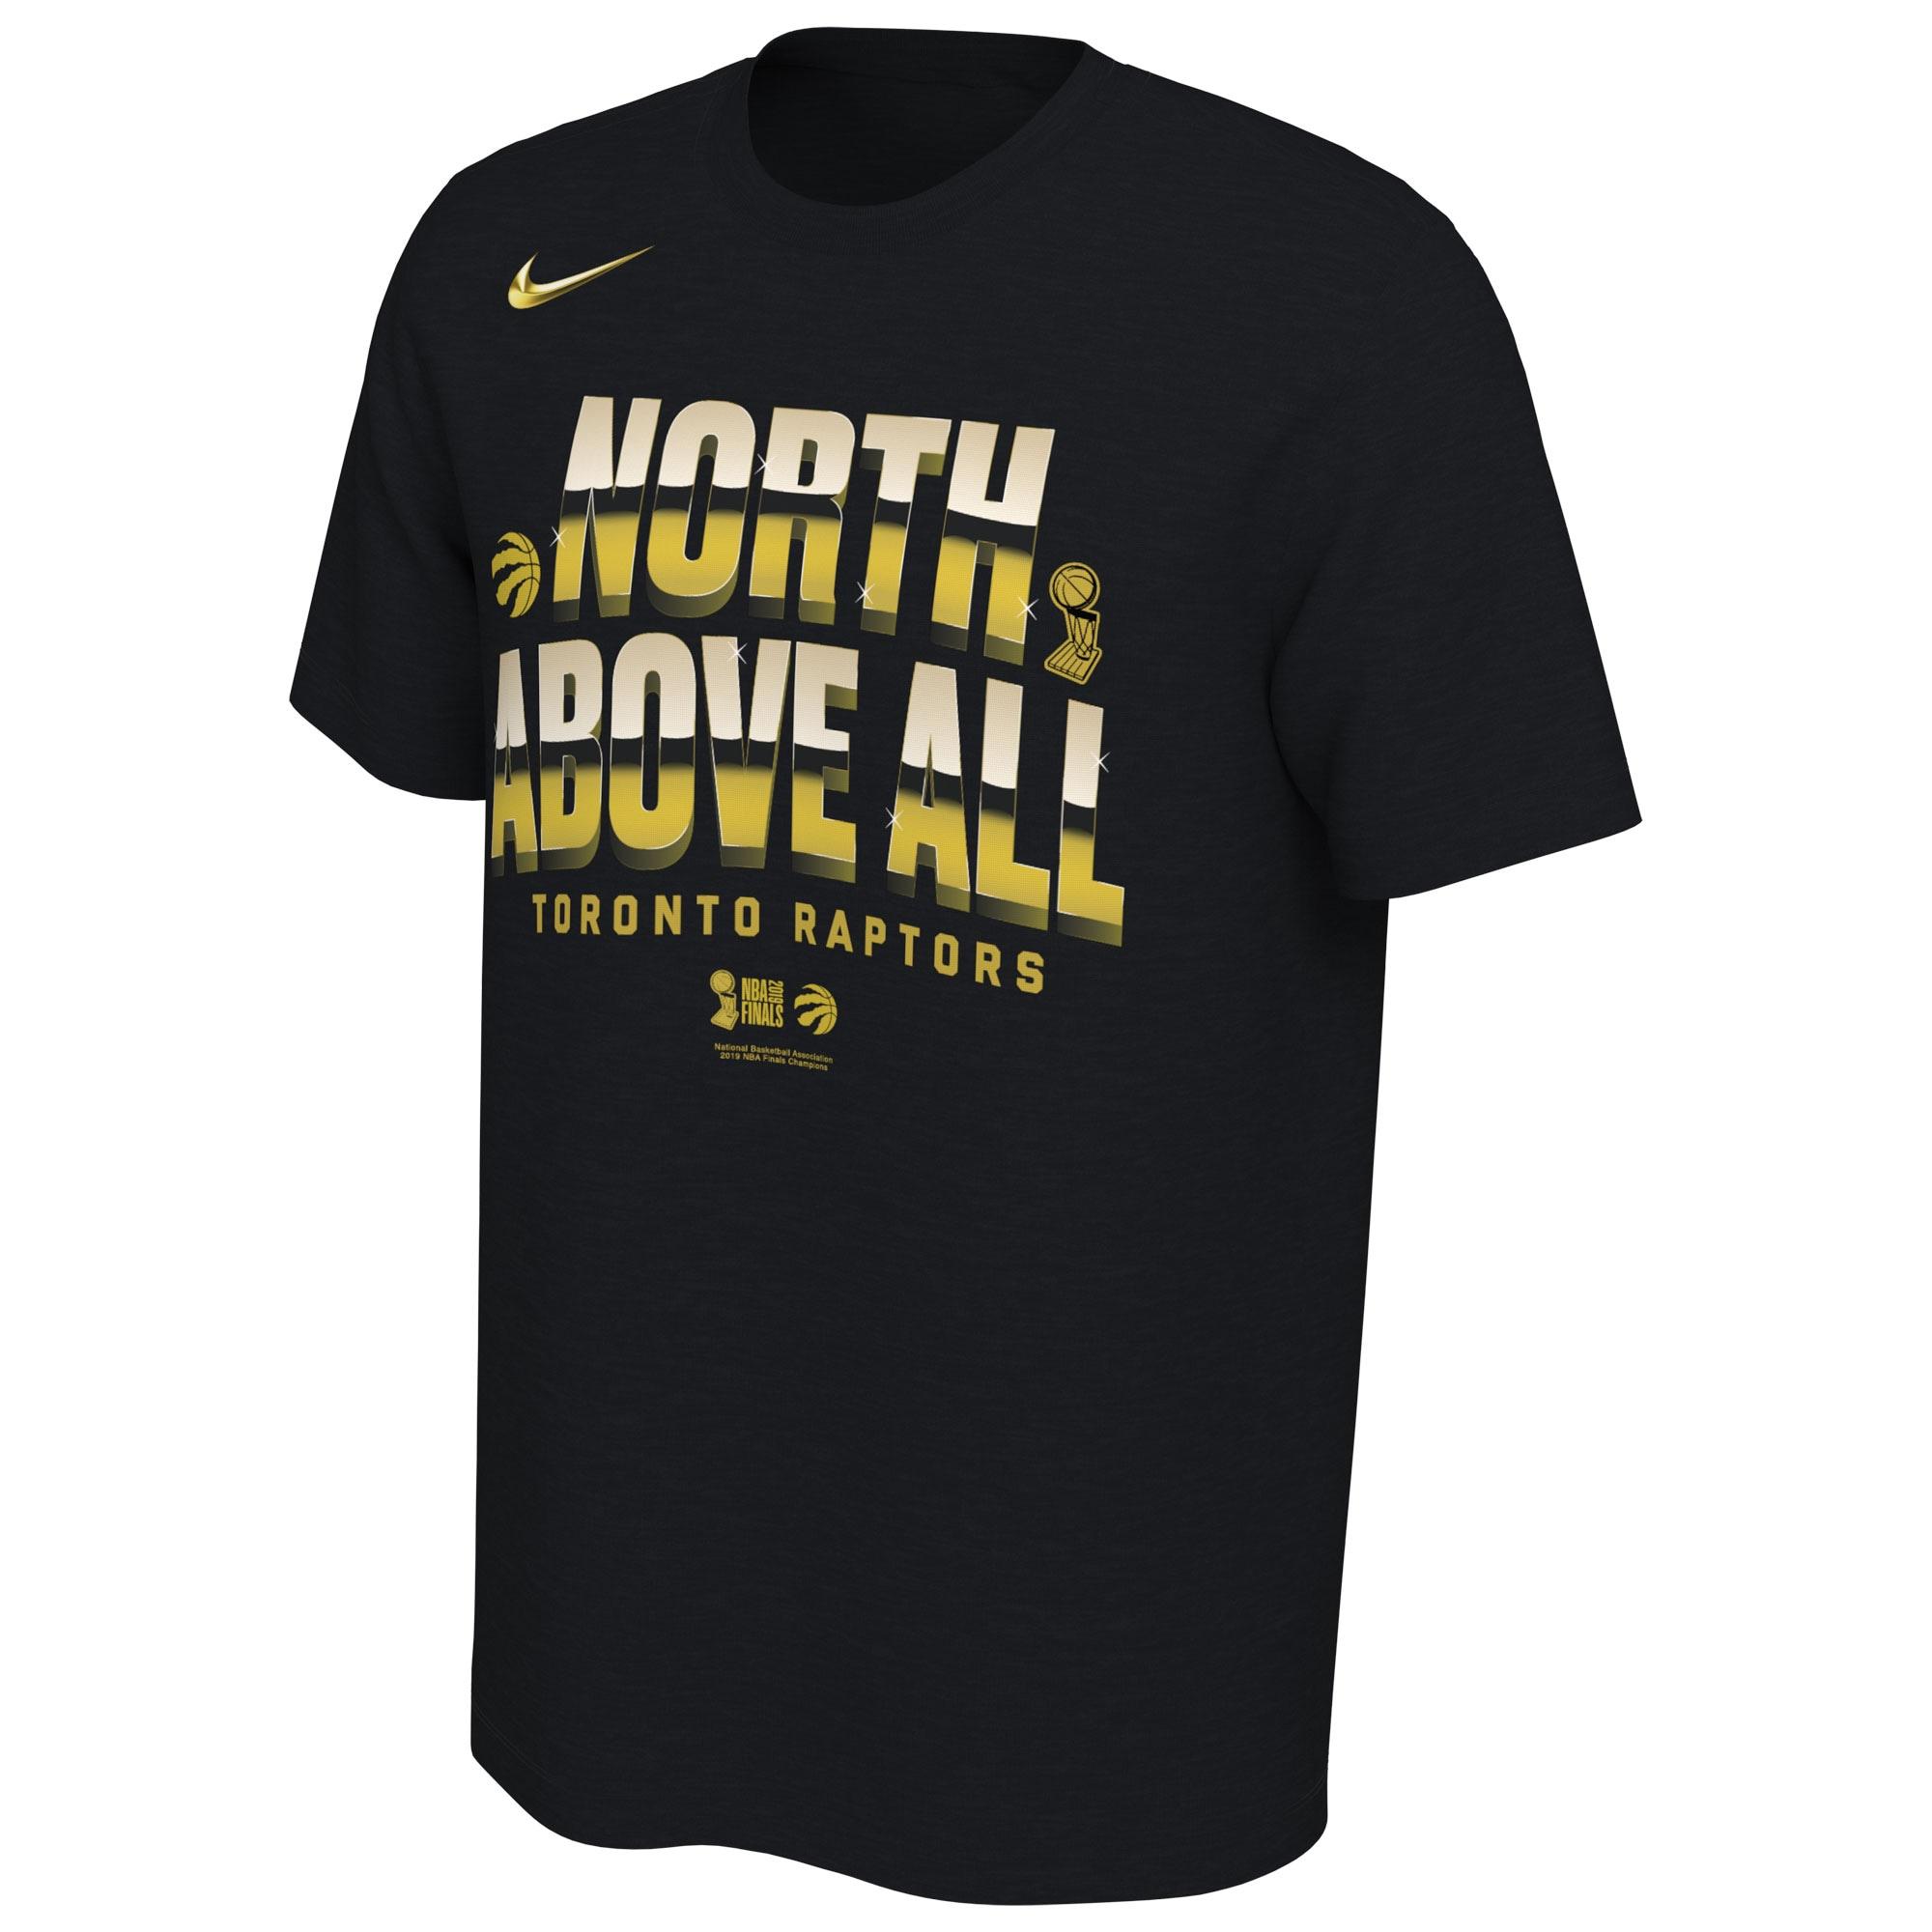 Toronto Raptors Nike 2019 NBA Finals Champions Celebration Mantra Performance T-Shirt - Black